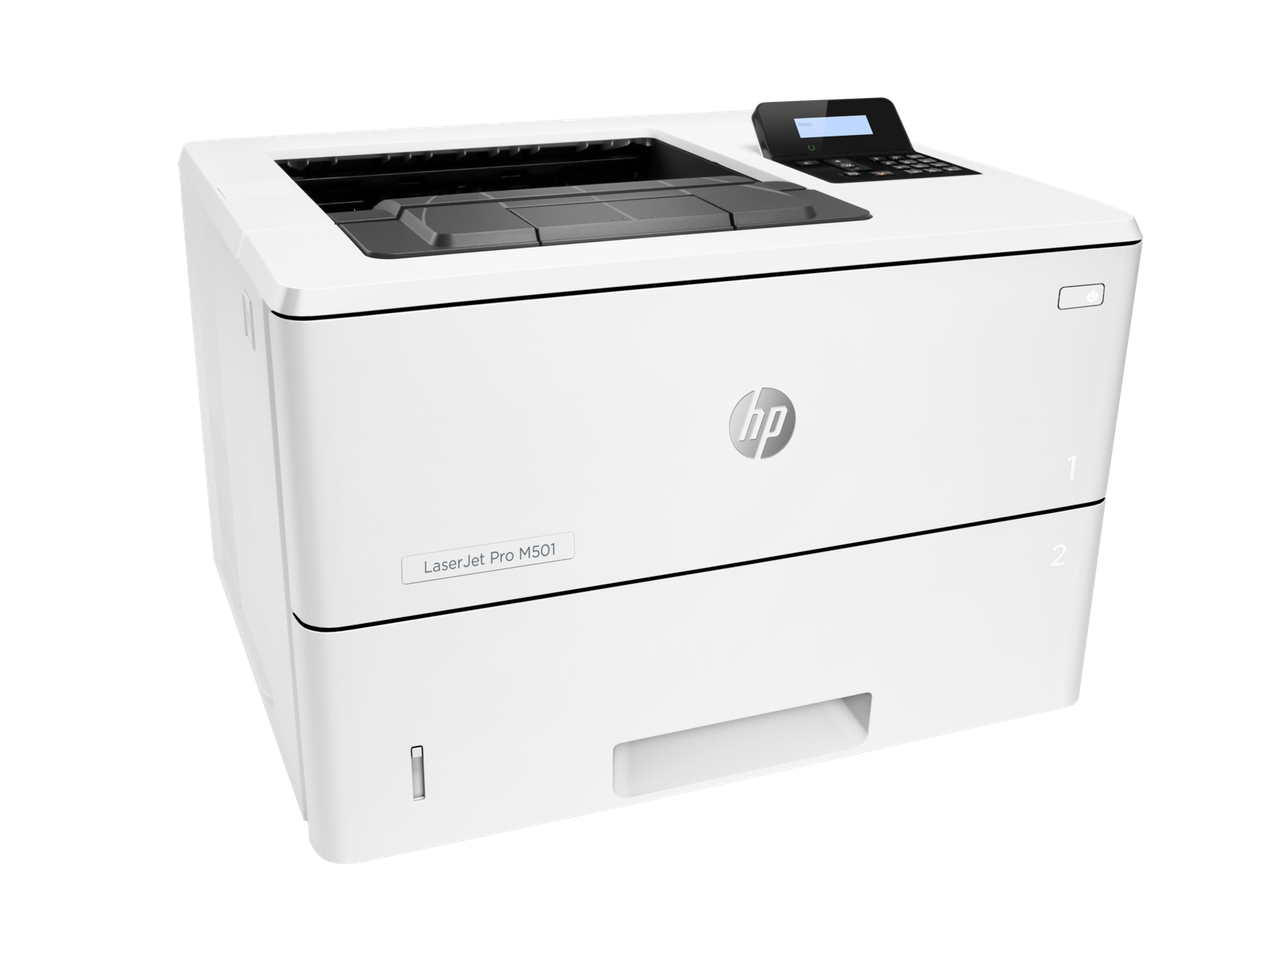 ПринтерHP J8H61A HP LaserJet Pro M501dn Printer (A4) , 600 dpi, 43 ppm, 256MB, 1500Mhz, tray 100+550 pages, D